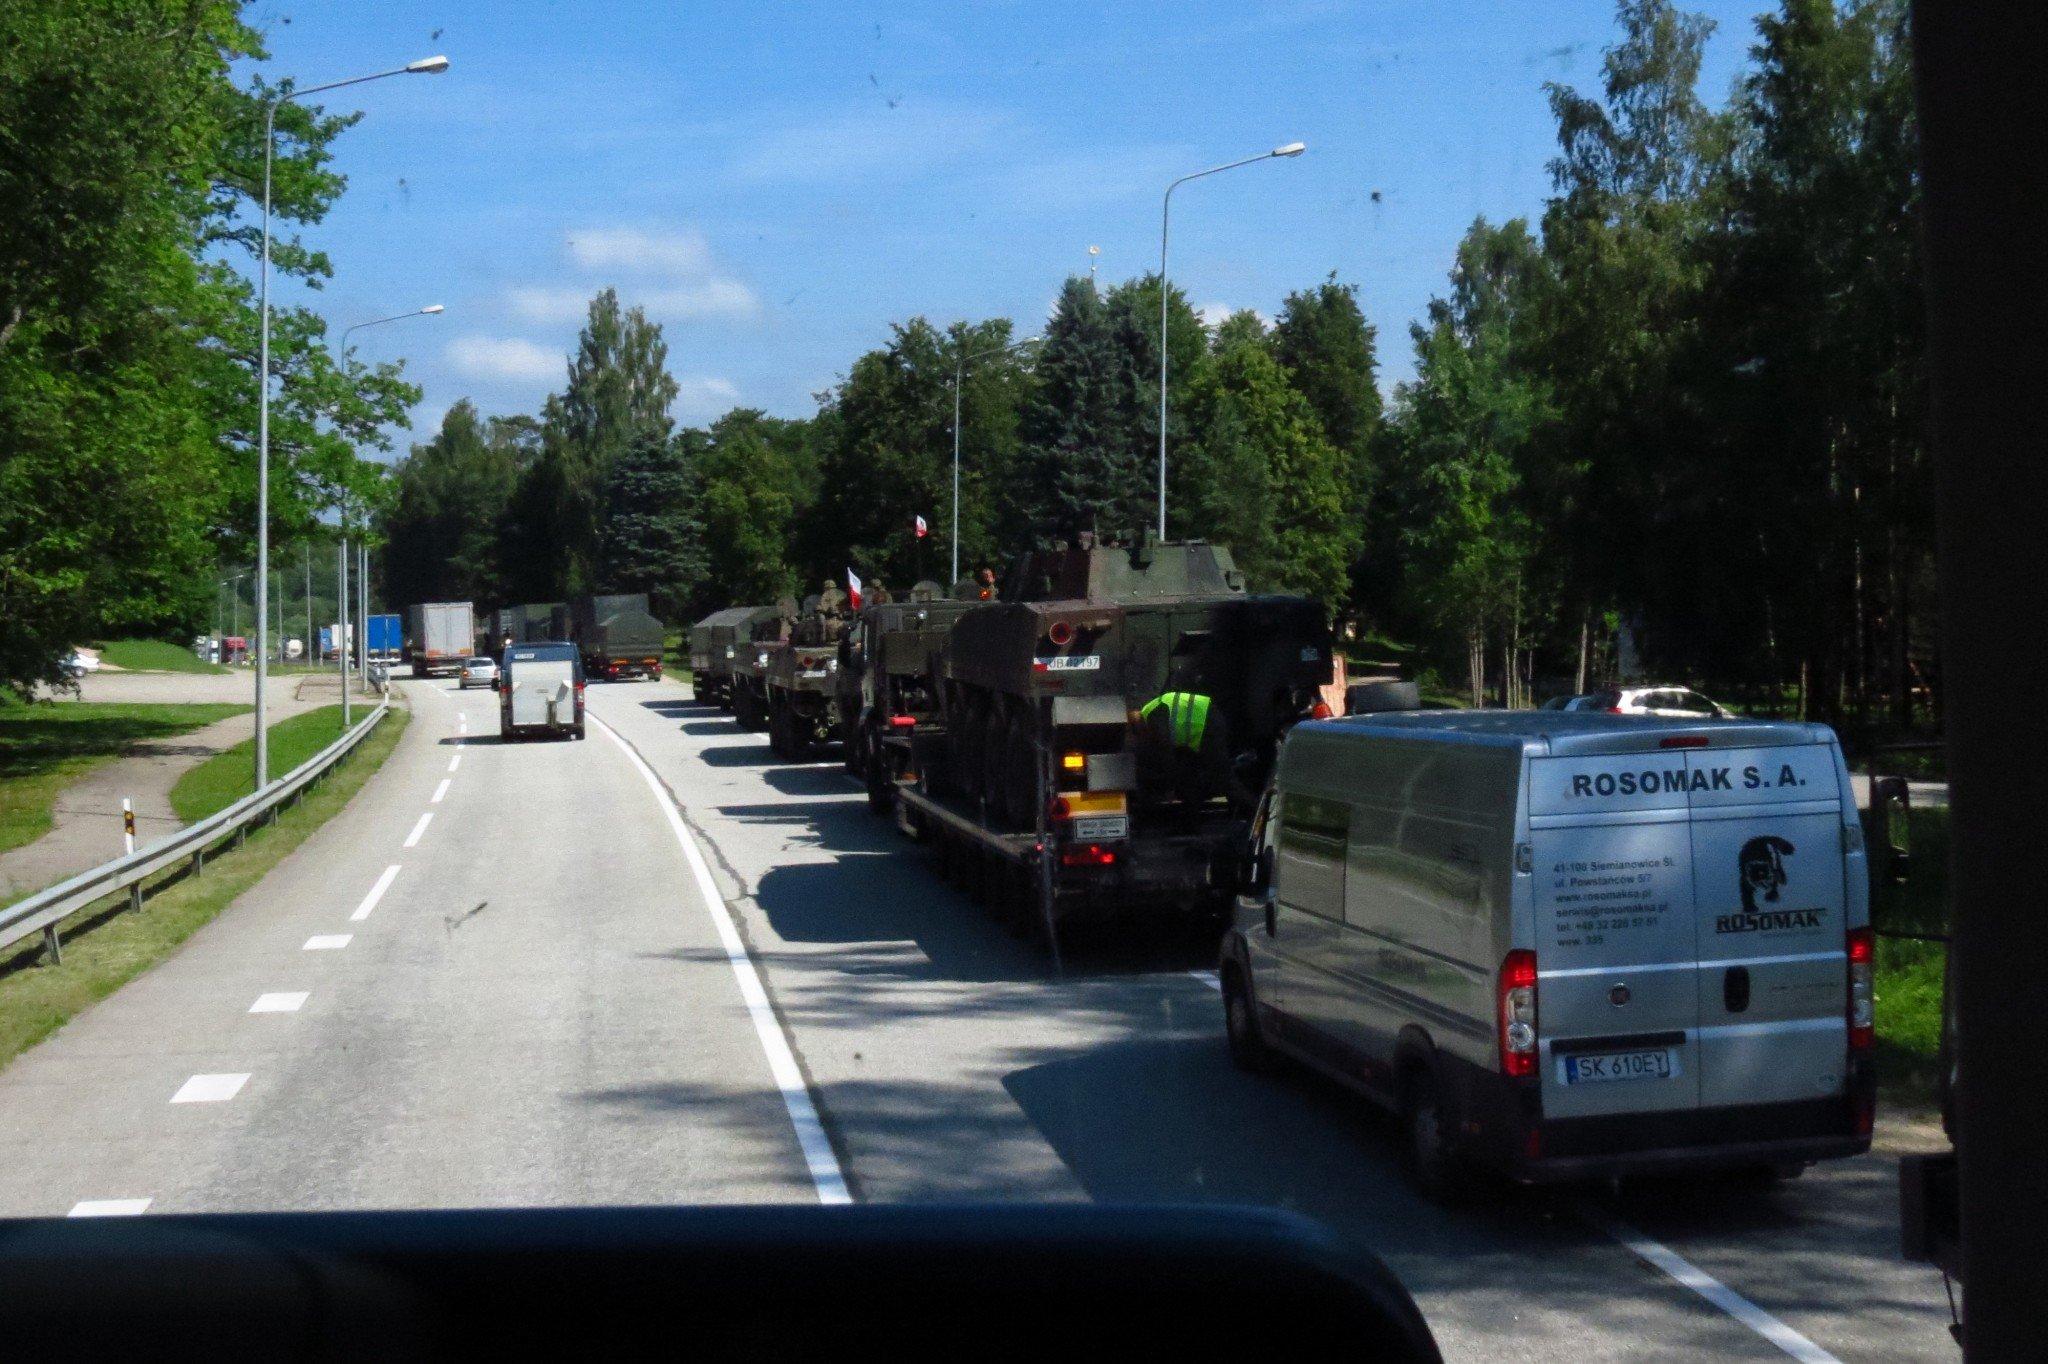 Baltian tilanne kiristyy